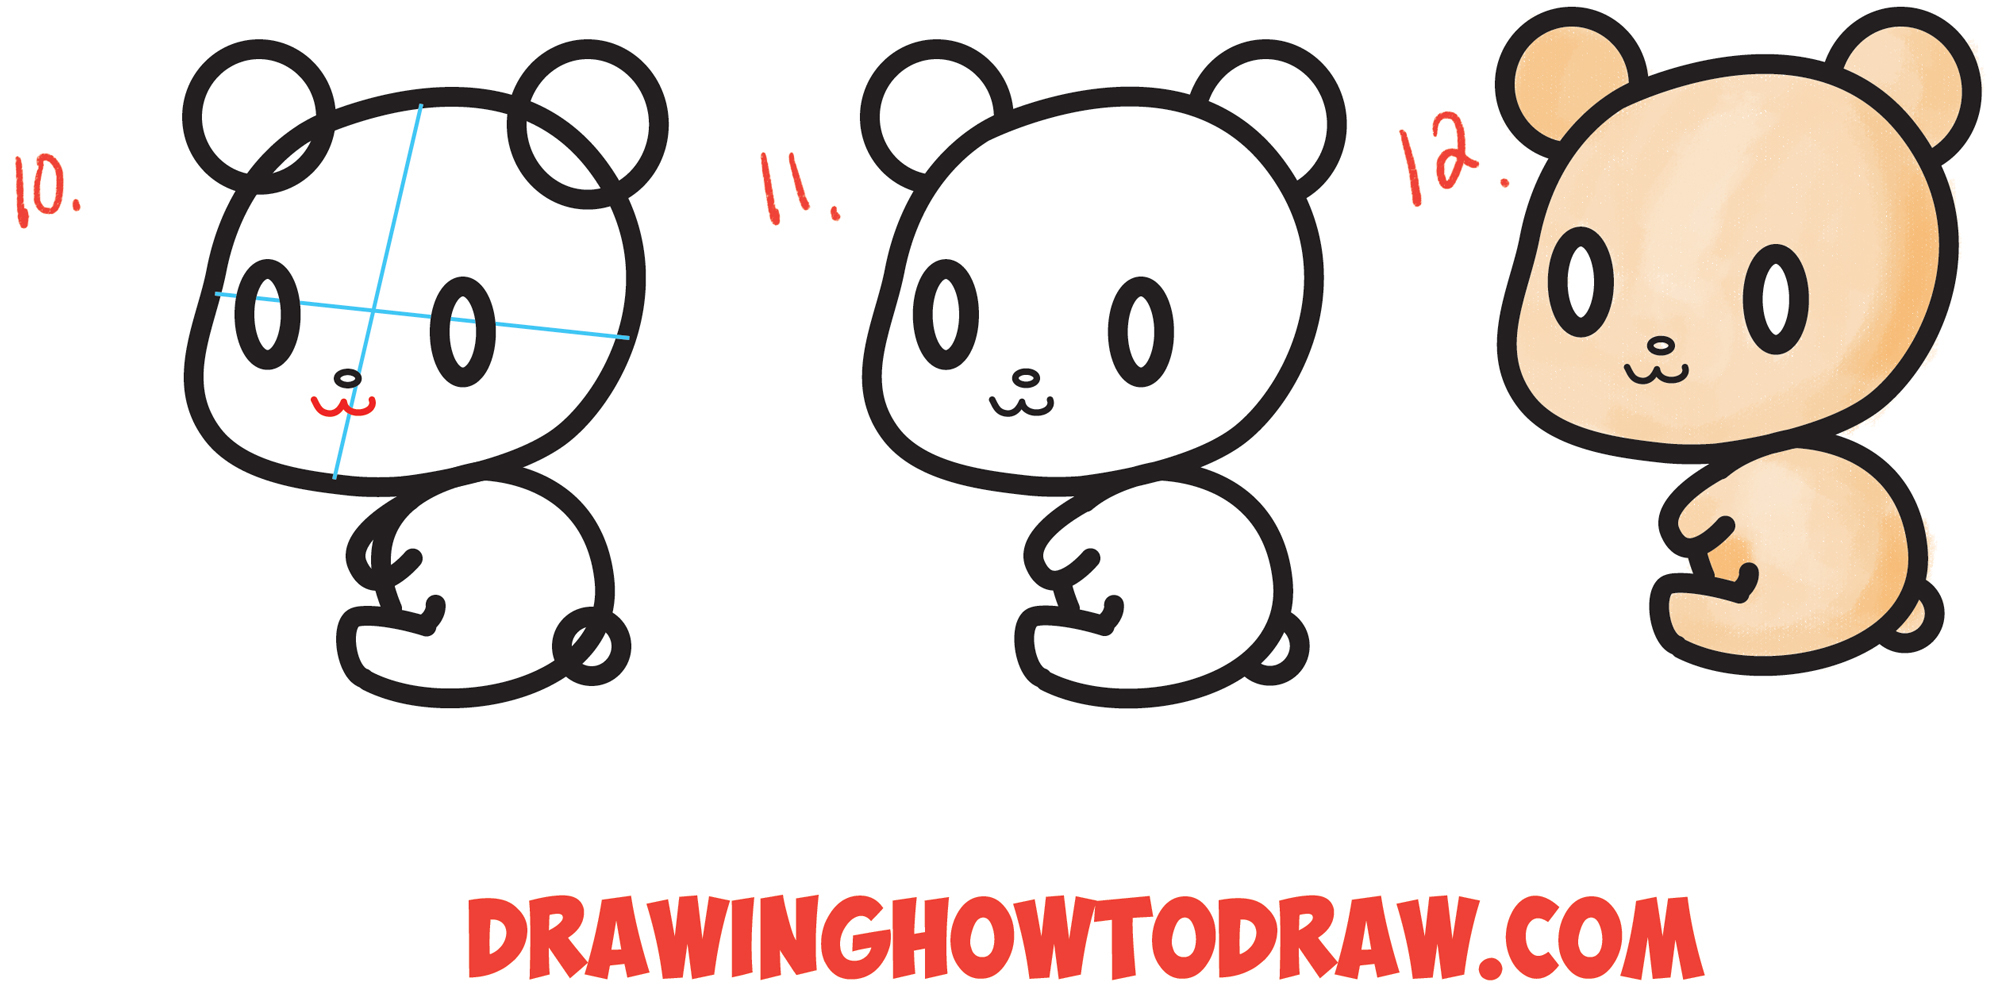 2000x984 Easy Bear Drawing How To Draw A Cute Chibi Kawaii Cartoon